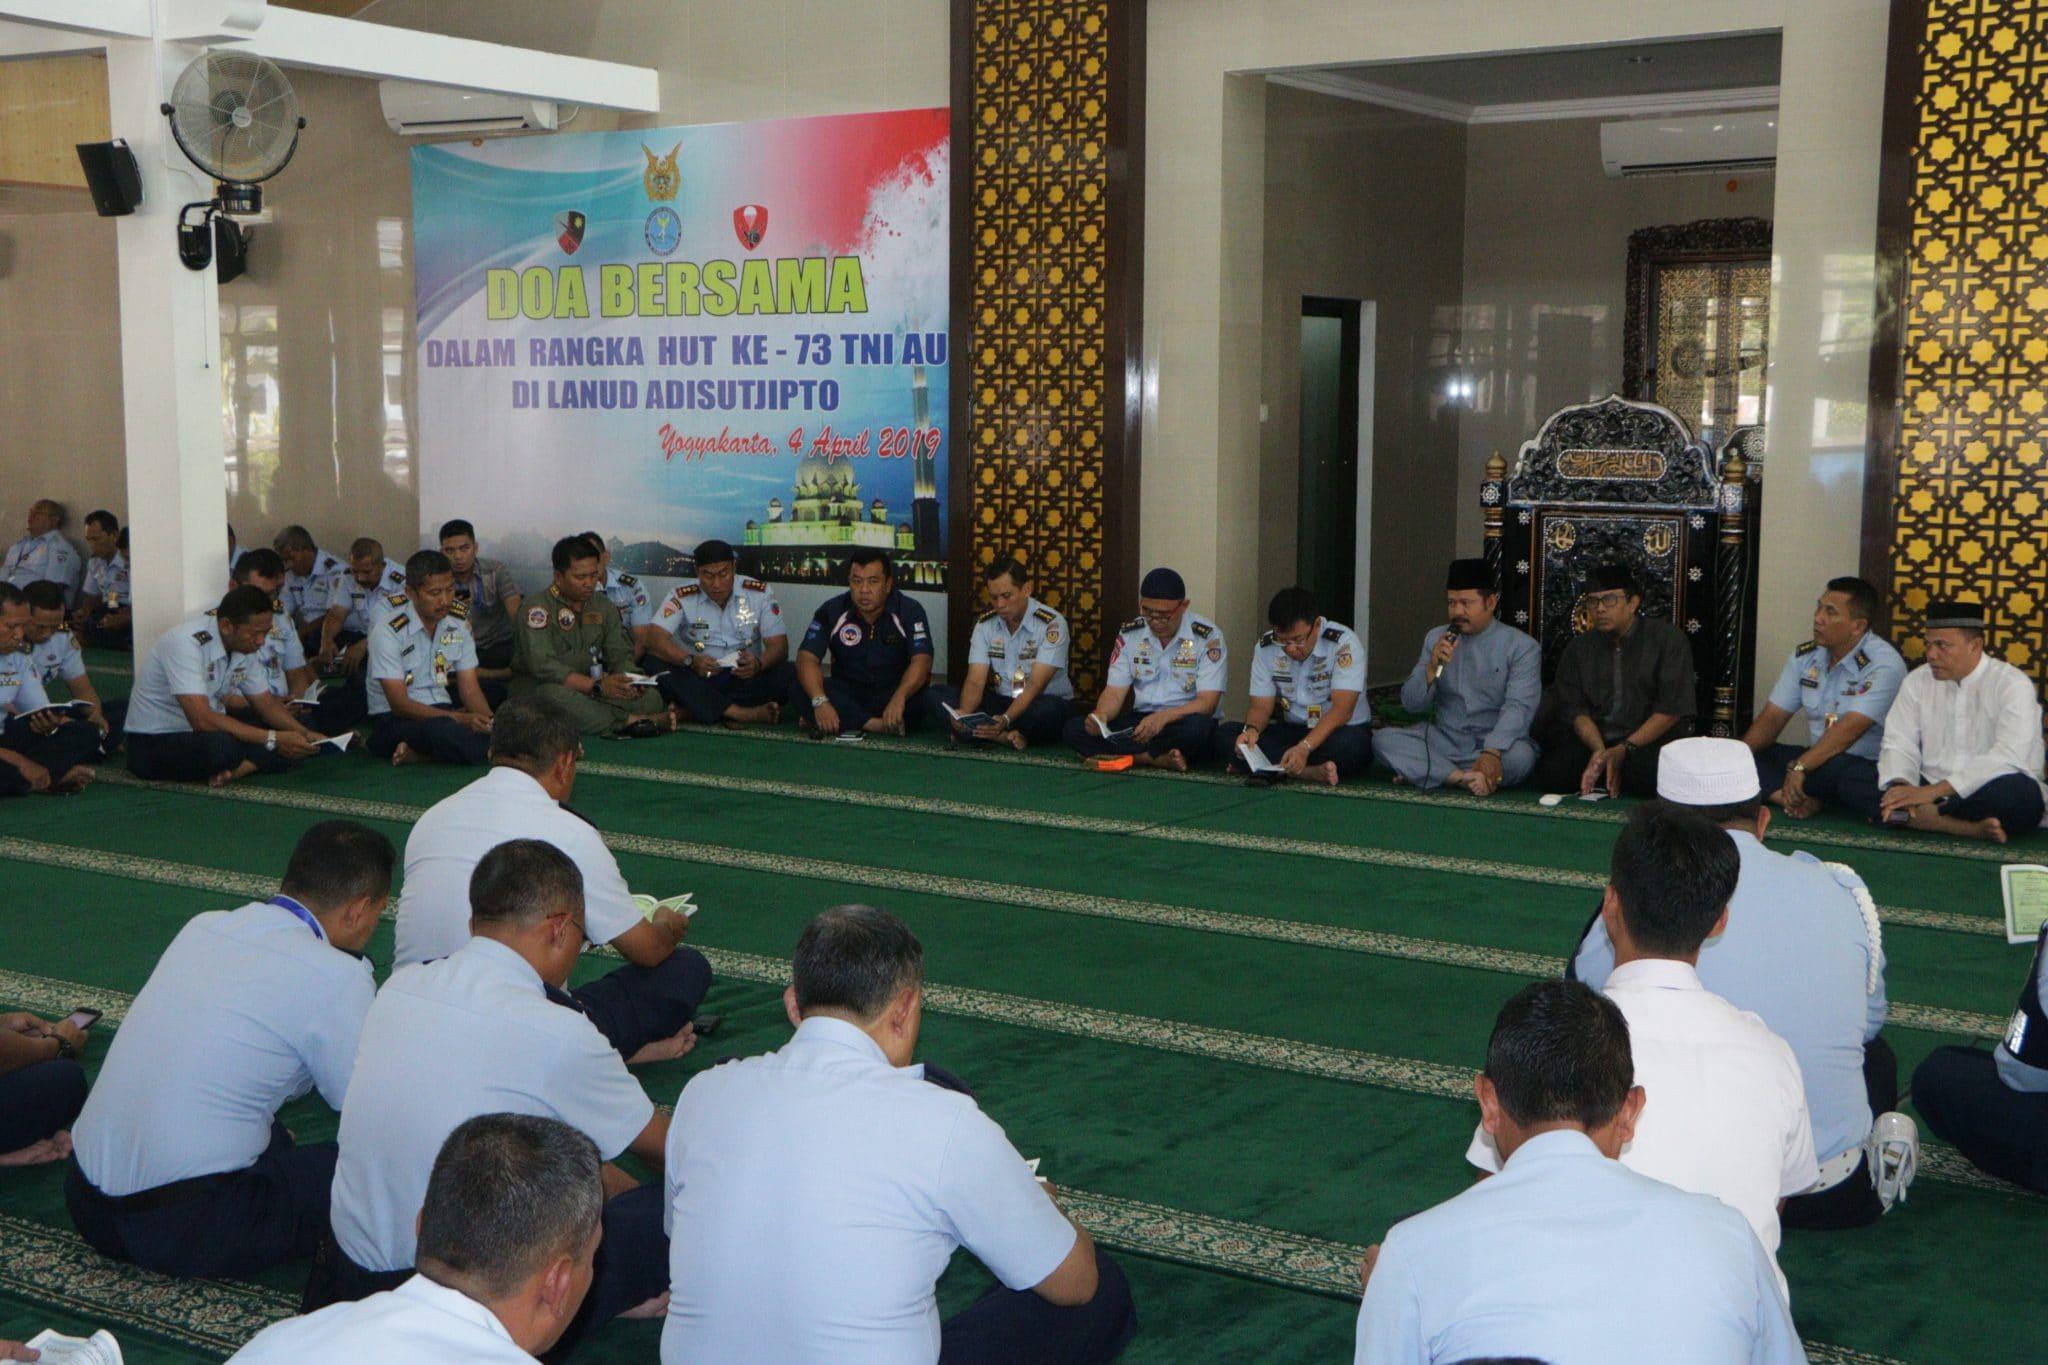 Jelang HUT ke-73 TNI AU, Lanud Adisutjipto Gelar Doa Bersama